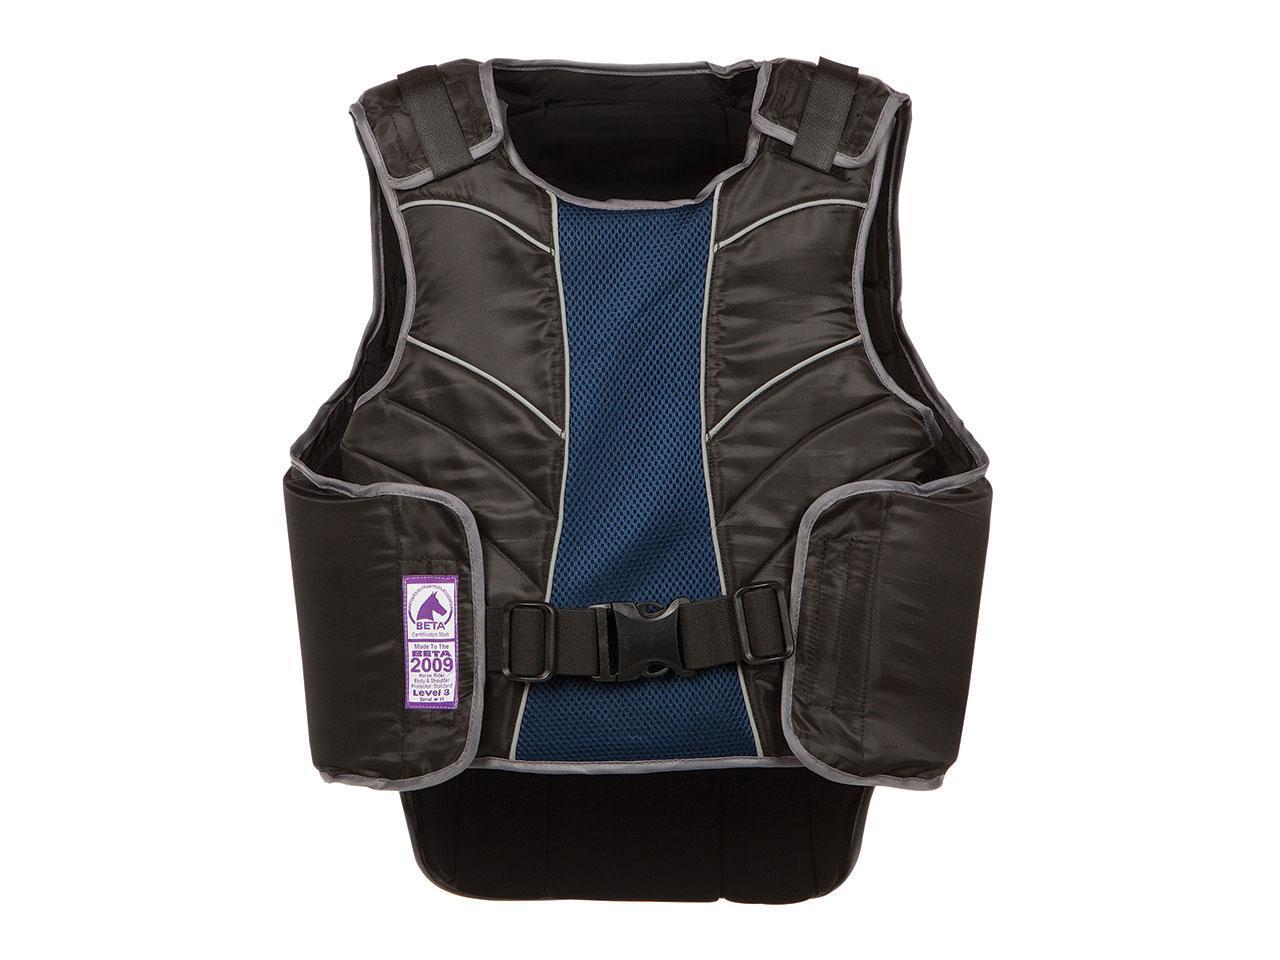 Supra Flex Body Protector